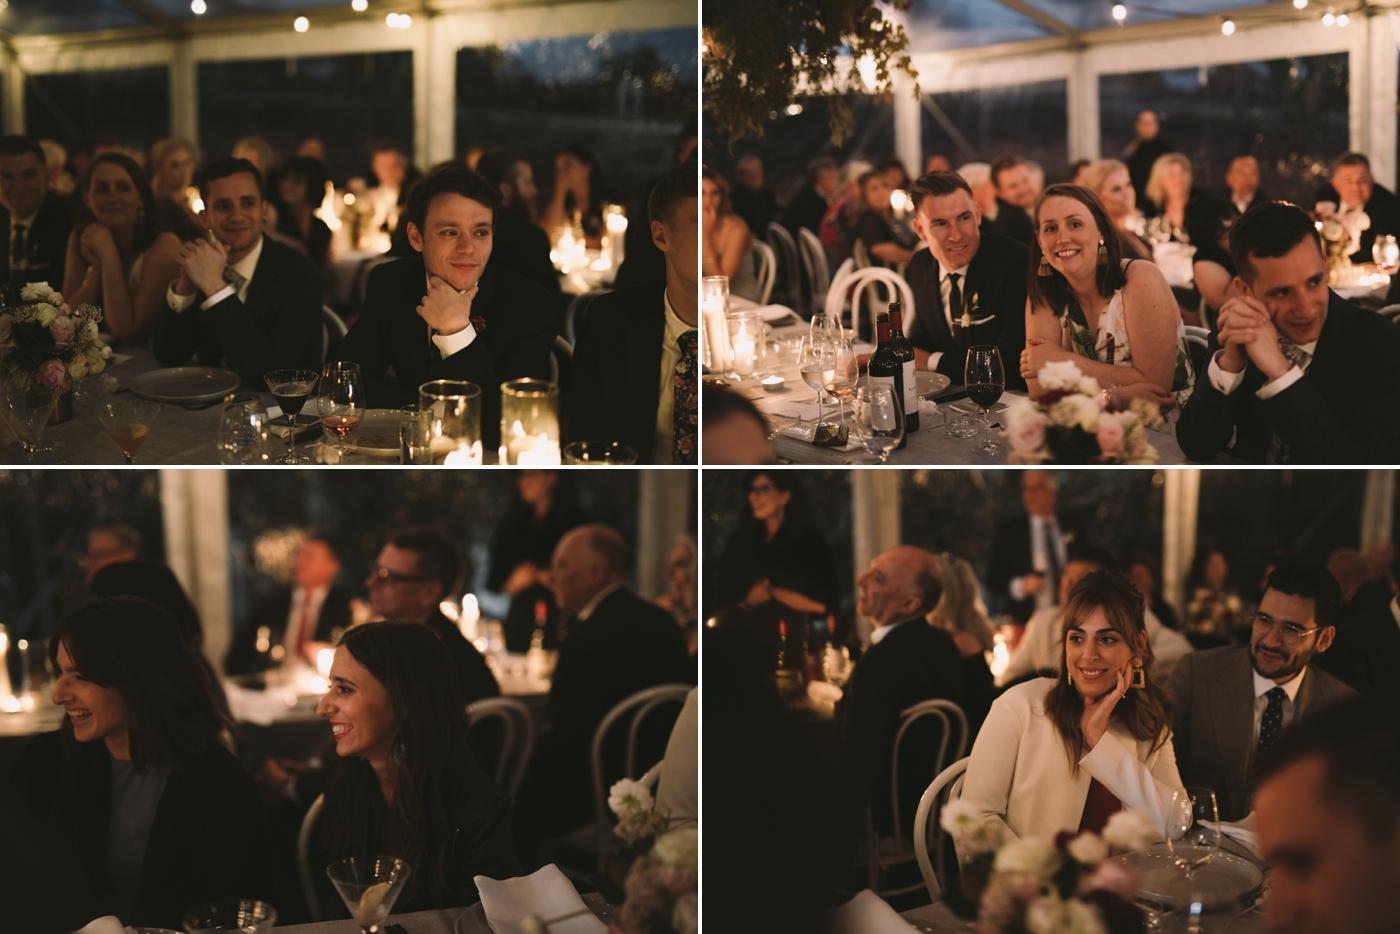 Katie and Ben - Natural Wedding Photography in Adelaide - Beautiful, Candid Wedding Photographer - Adelaide Hills Wedding - Katherine Schultz - www.katherineschultzphotography.com_0073.jpg